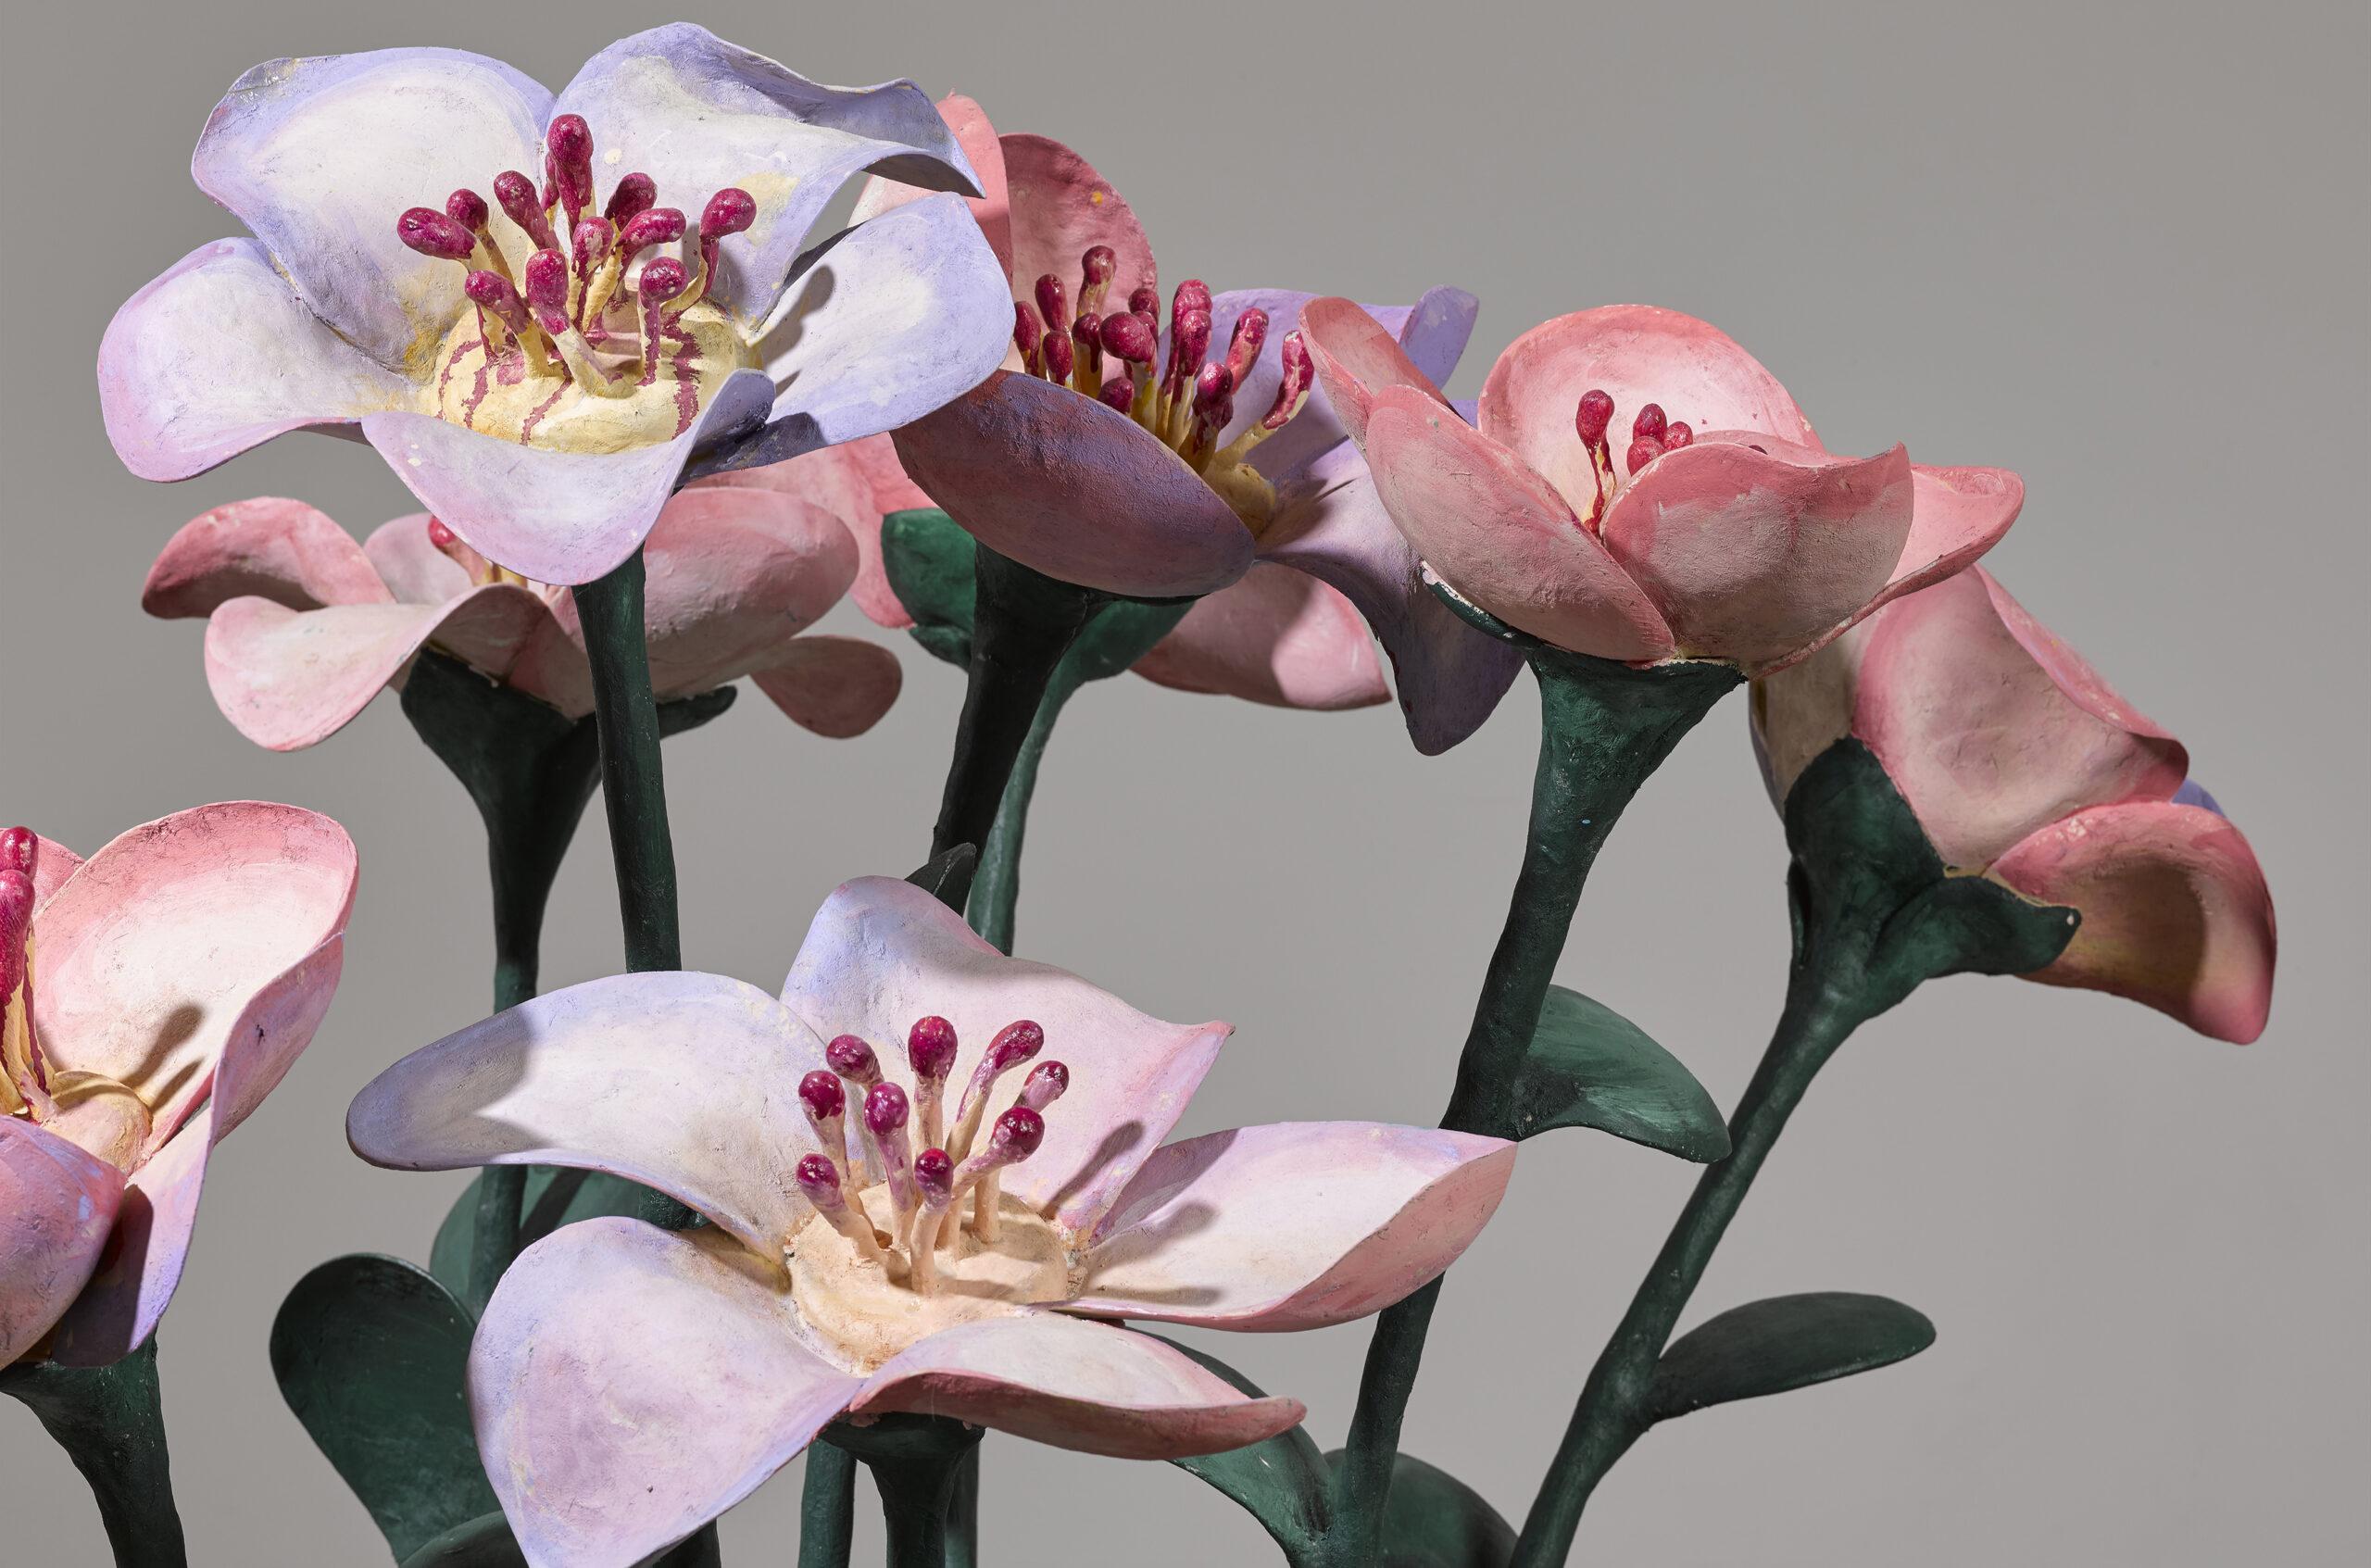 FOREDRAG: Skæve blomster